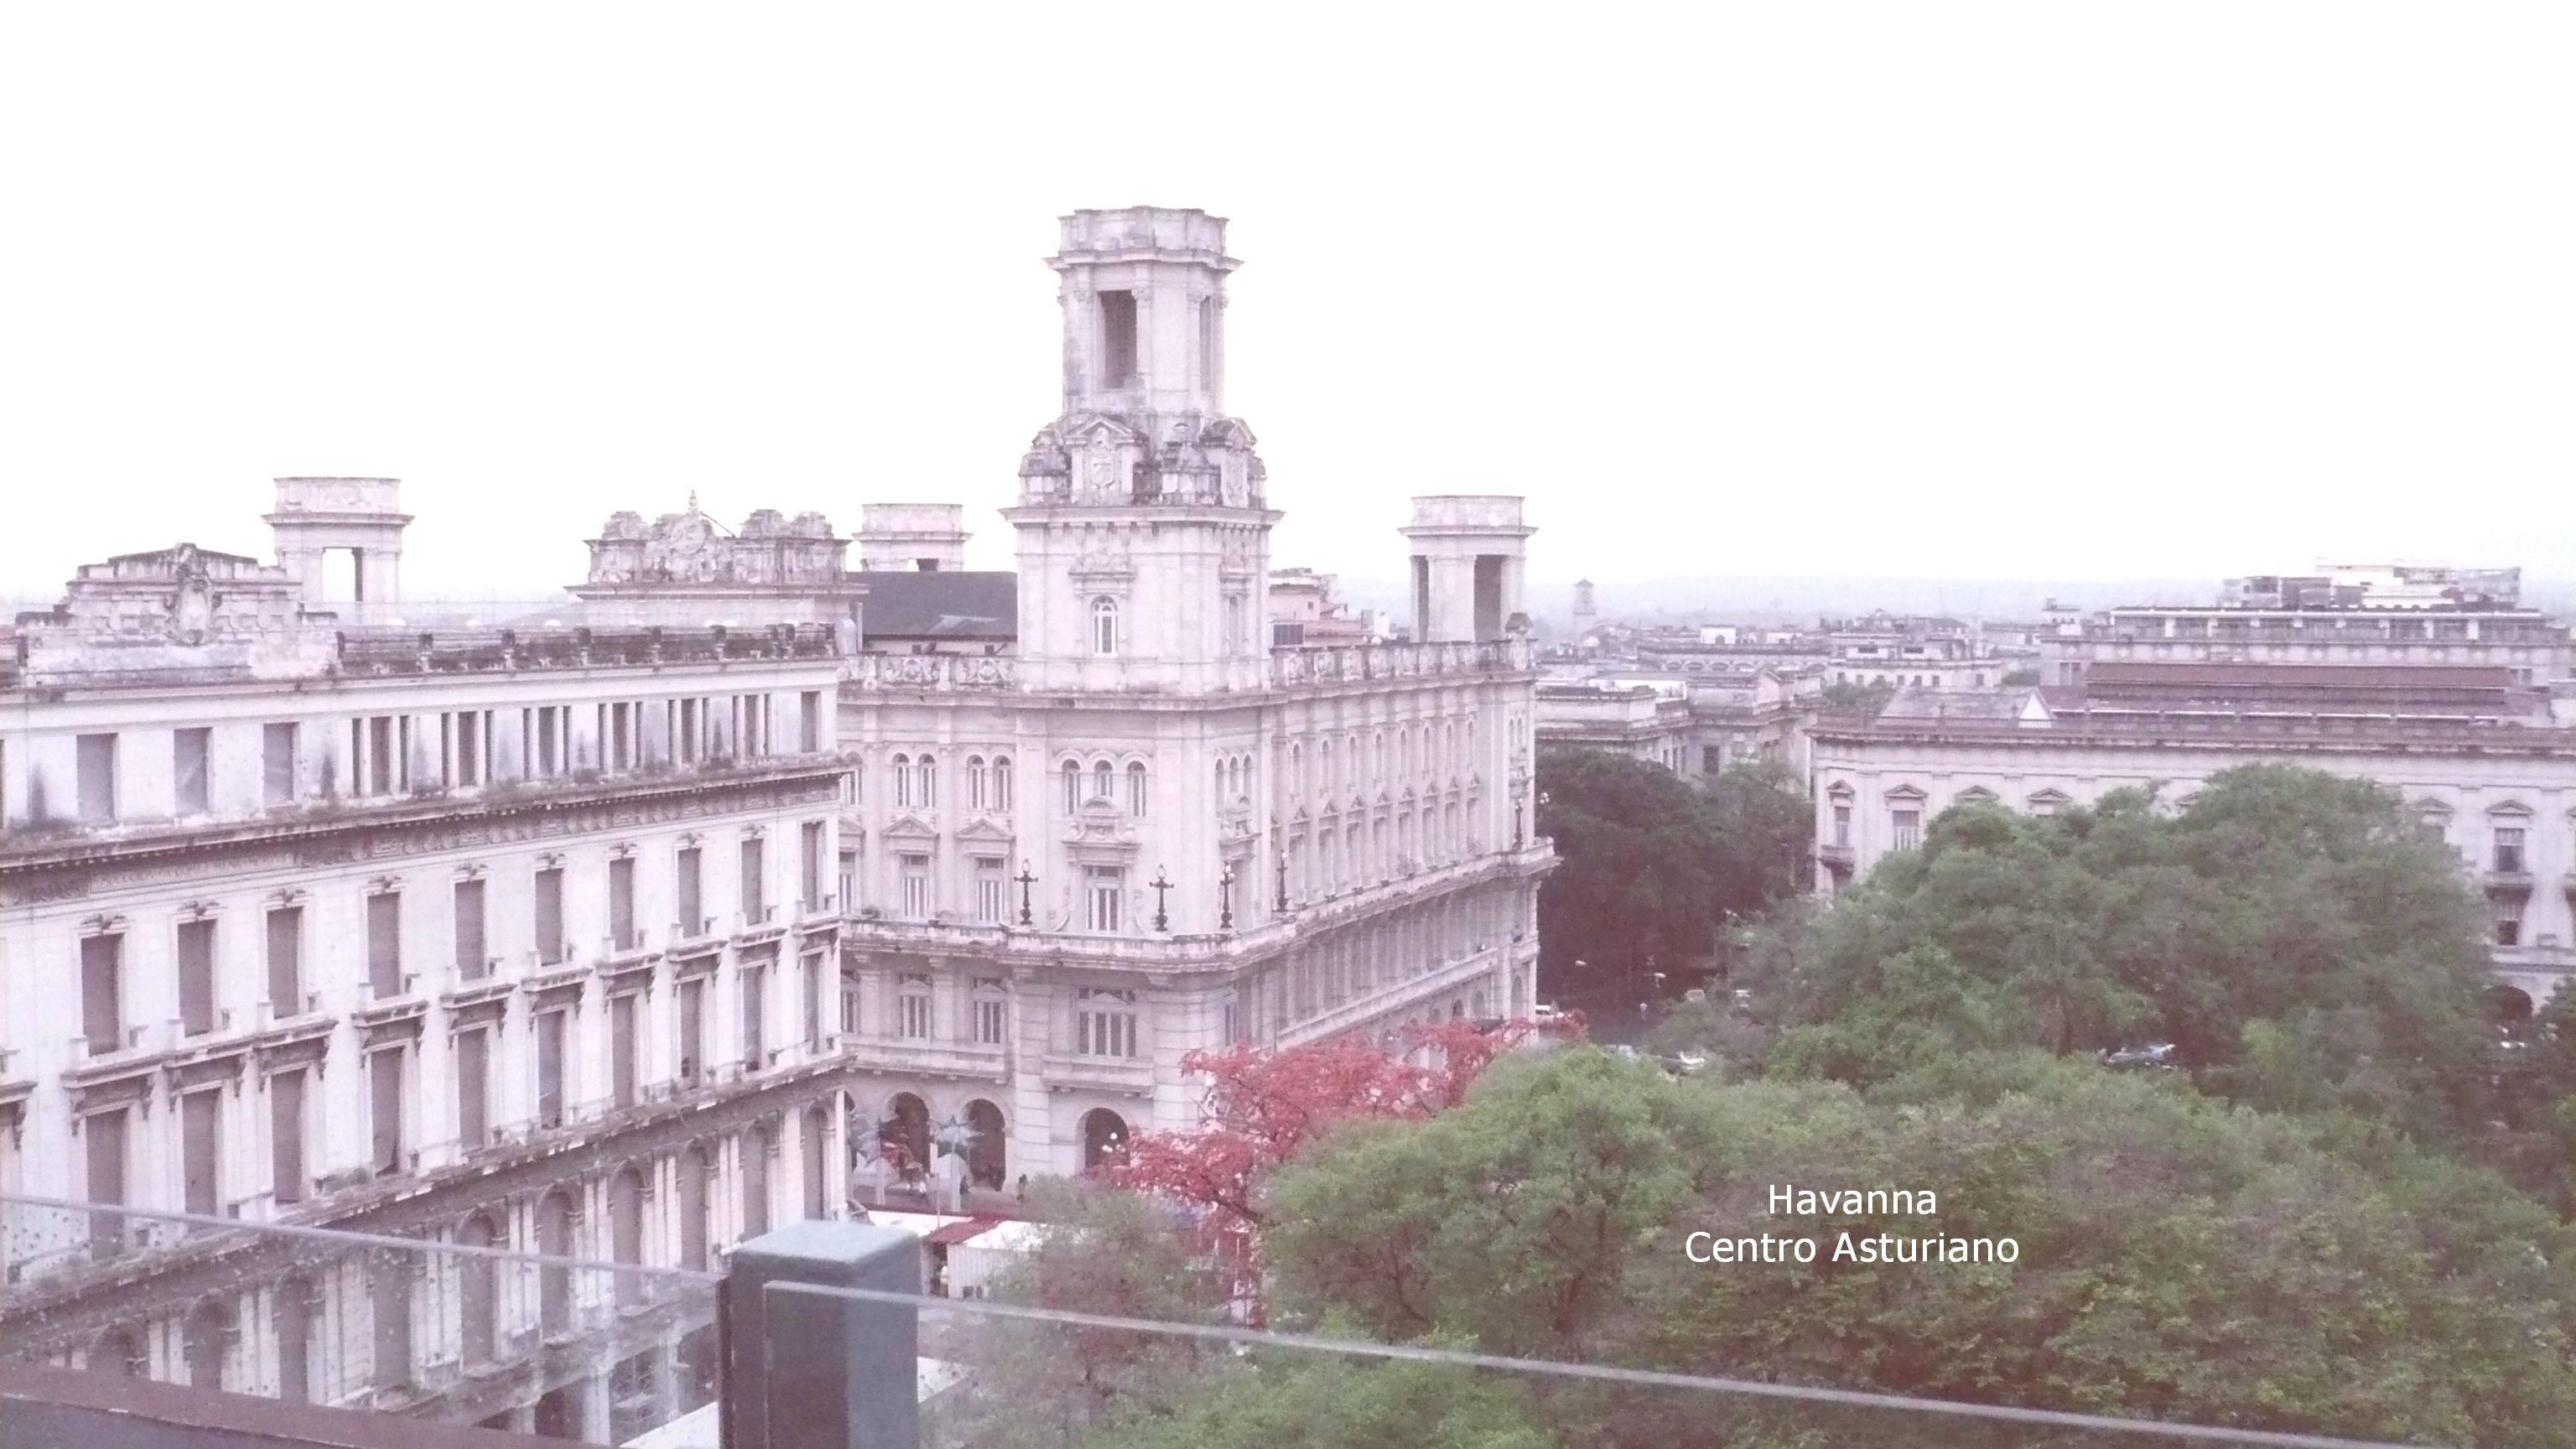 Hotel nh parque central torre in havanna holidaycheck for Calle neptuno e prado y zulueta habana vieja habana cuba